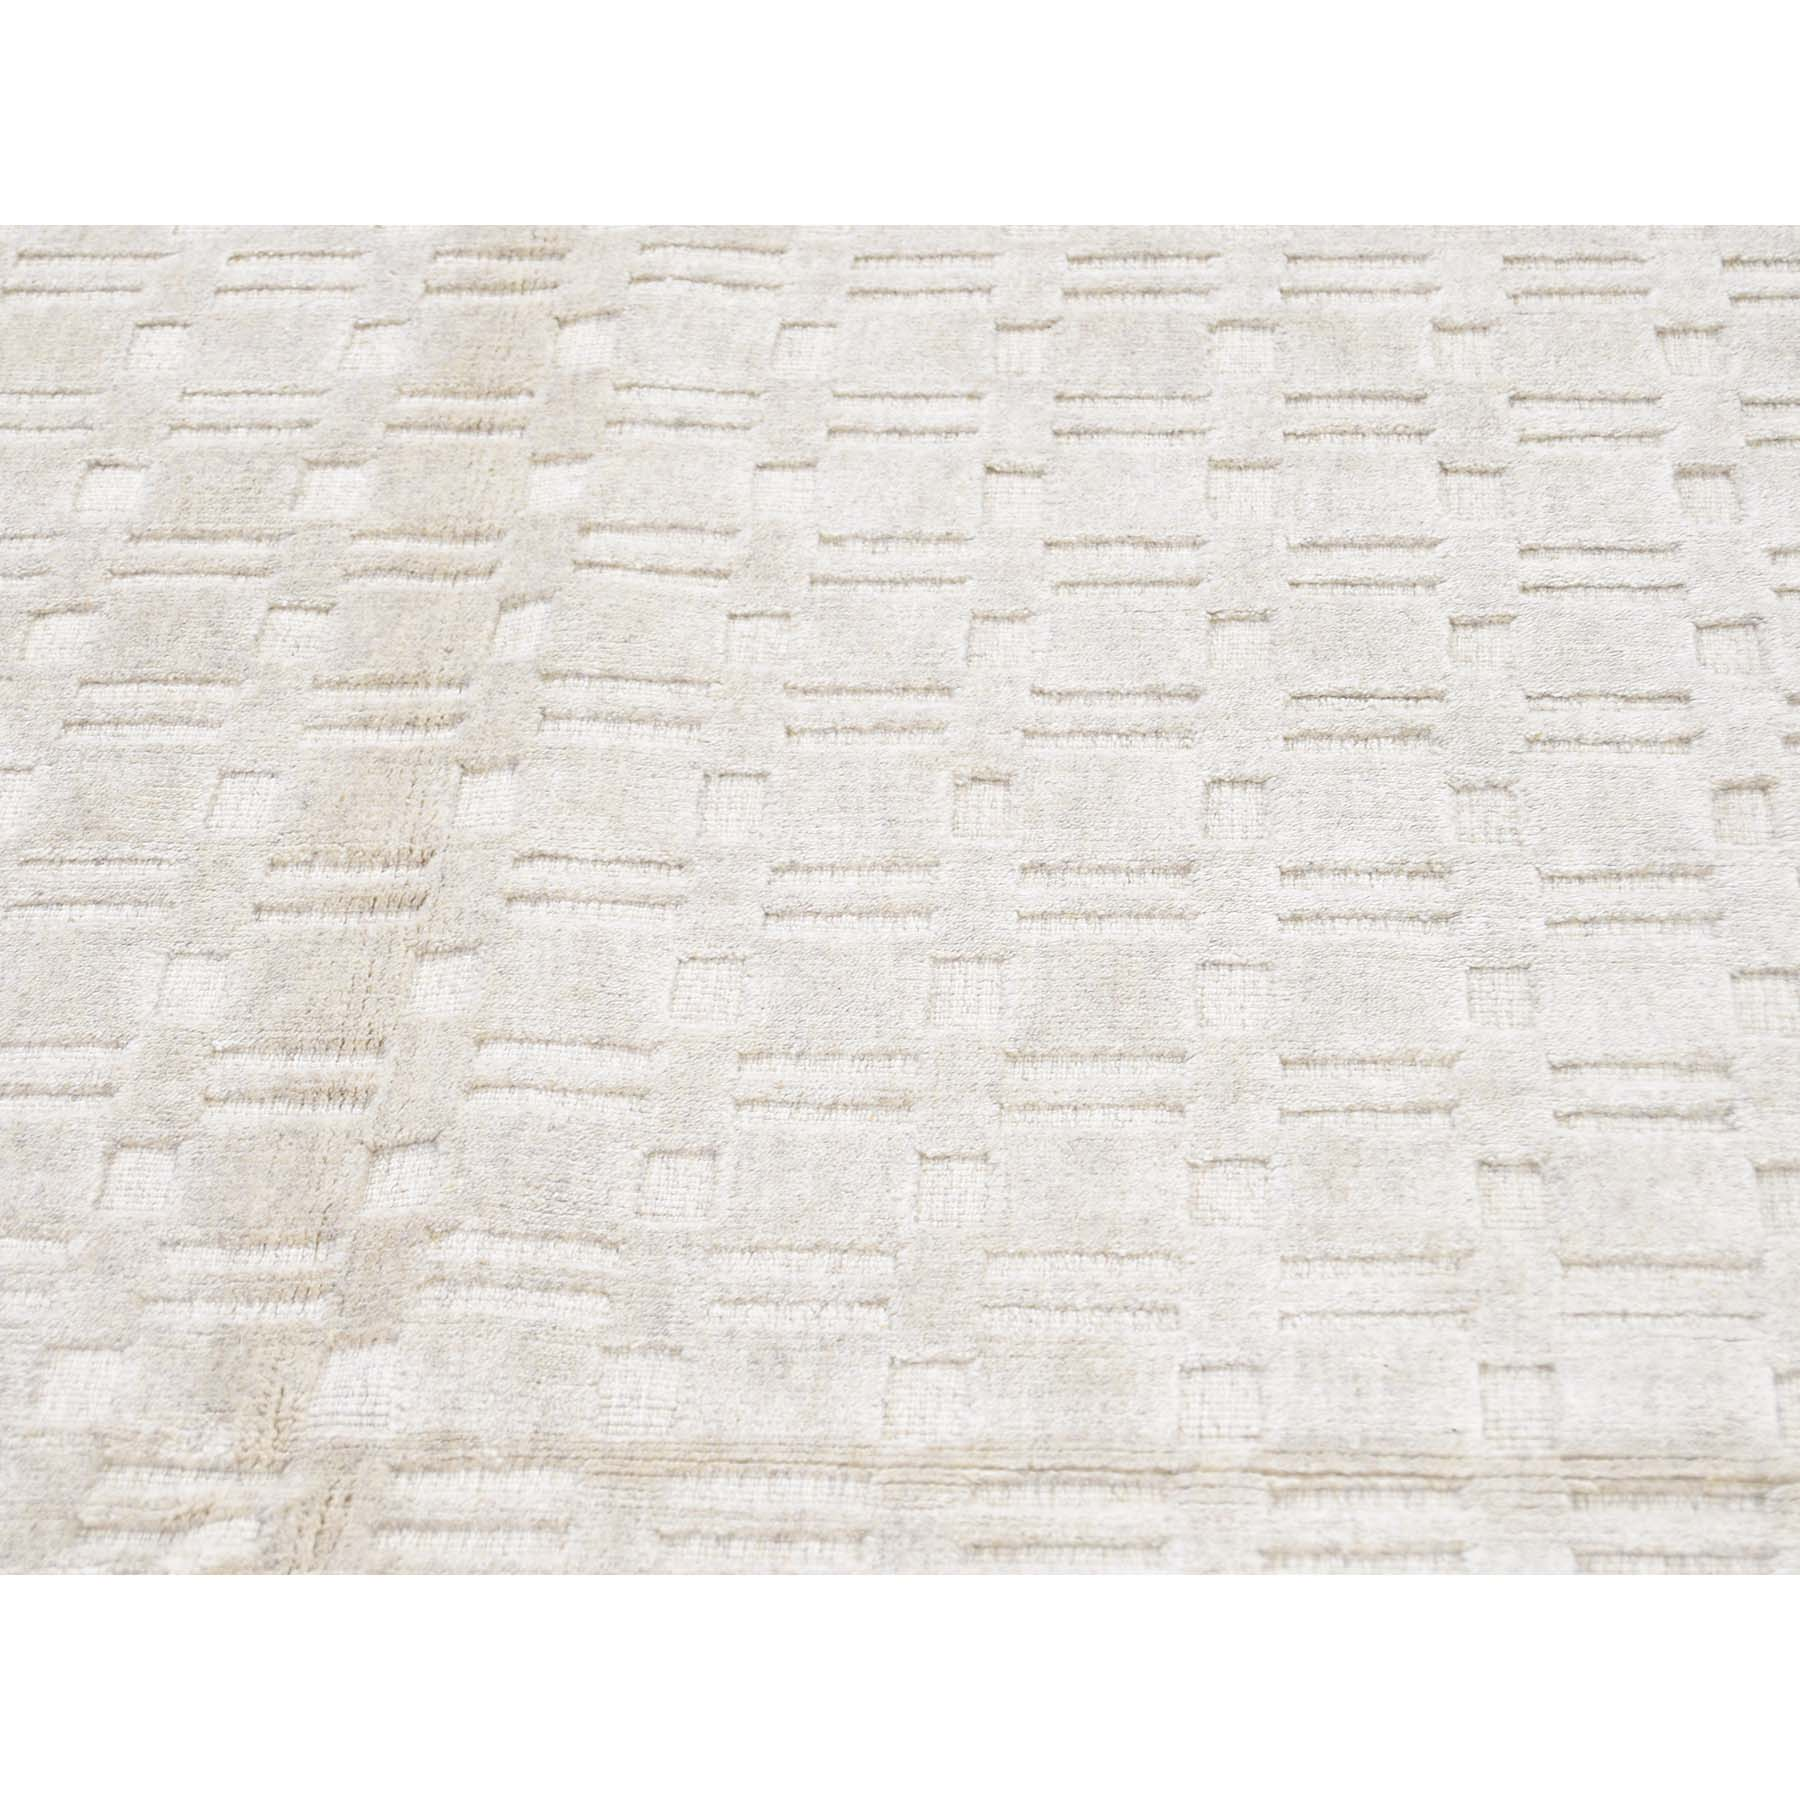 5-1 x7-1  Hand-Loomed Pure Wool Tone on Tone Oriental Rug